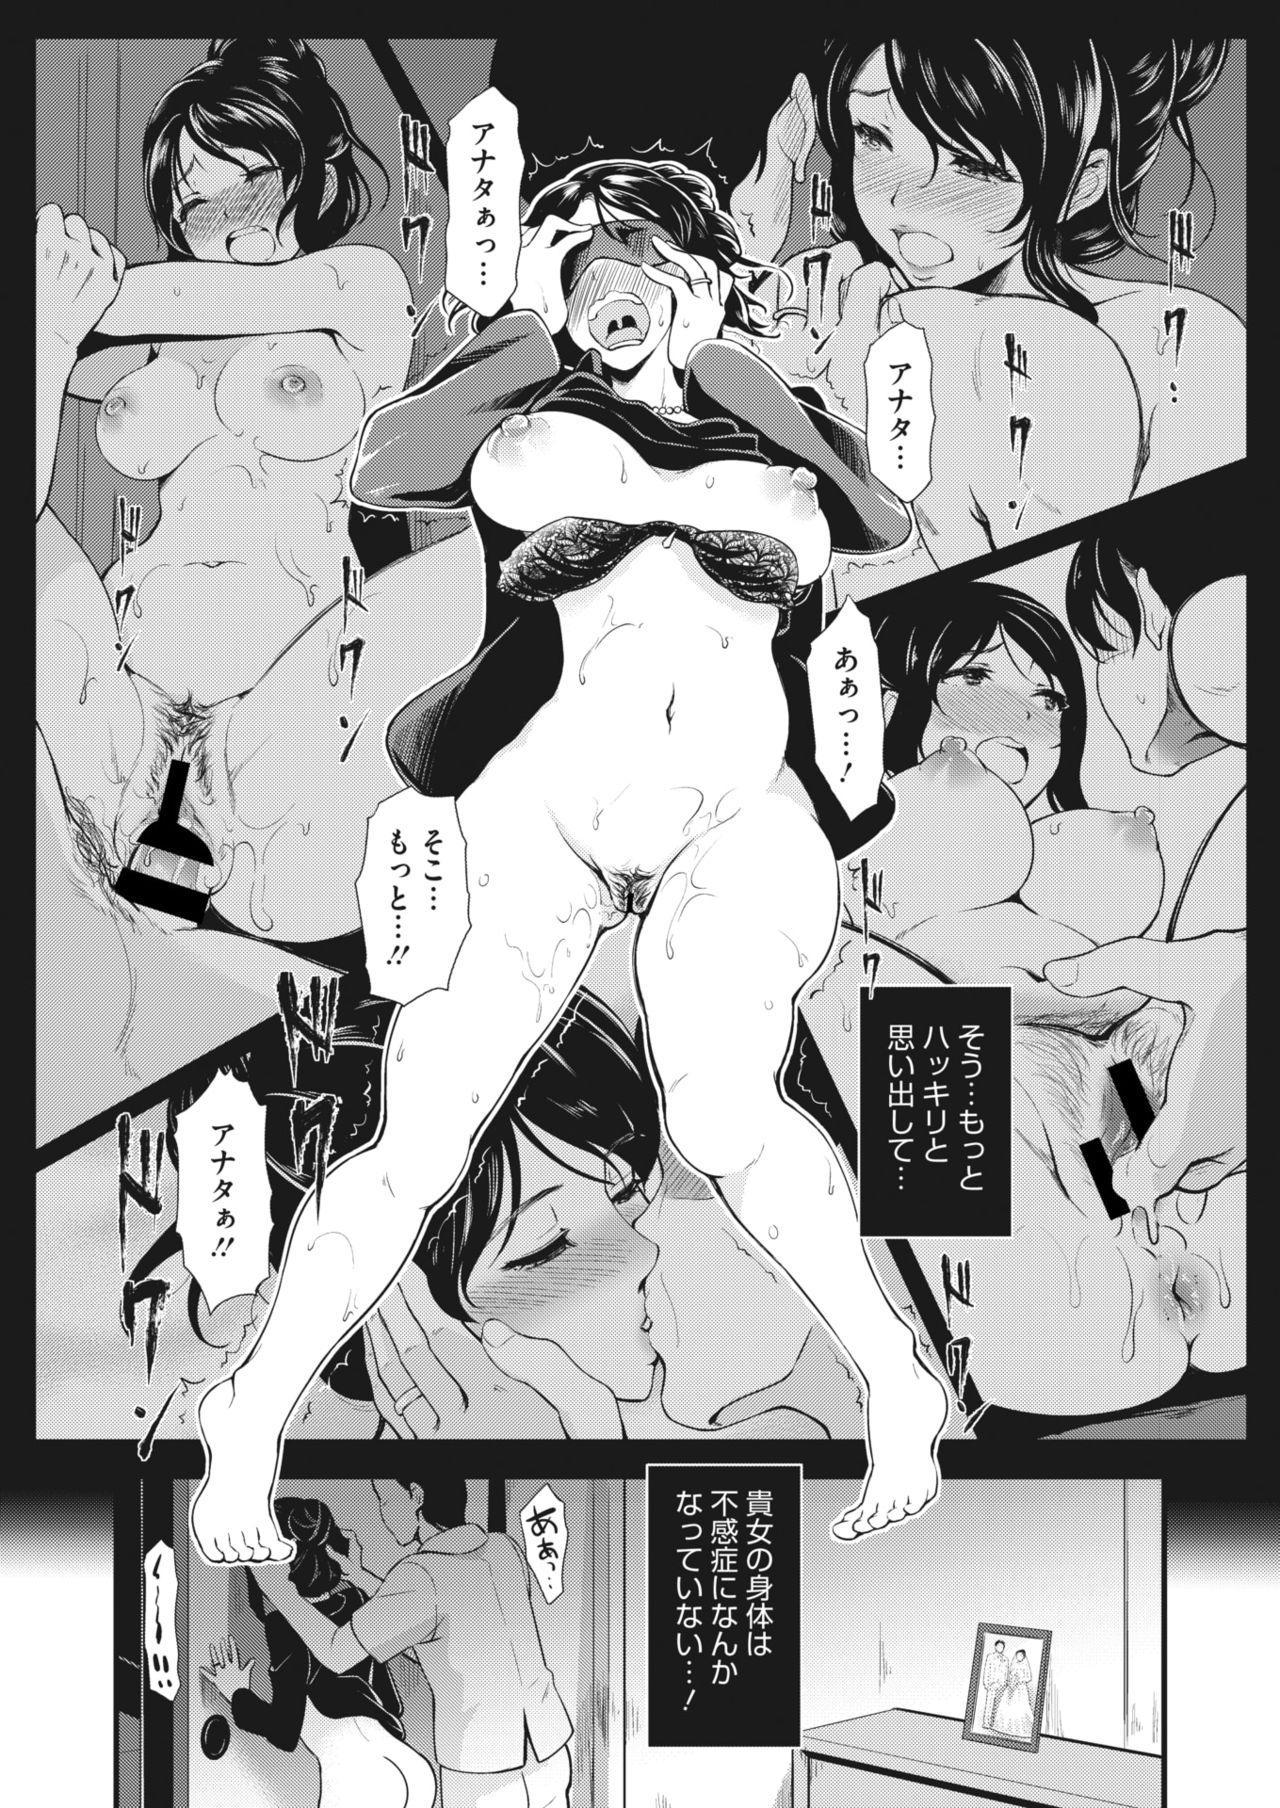 COMIC HOTMiLK Koime Vol. 22 196